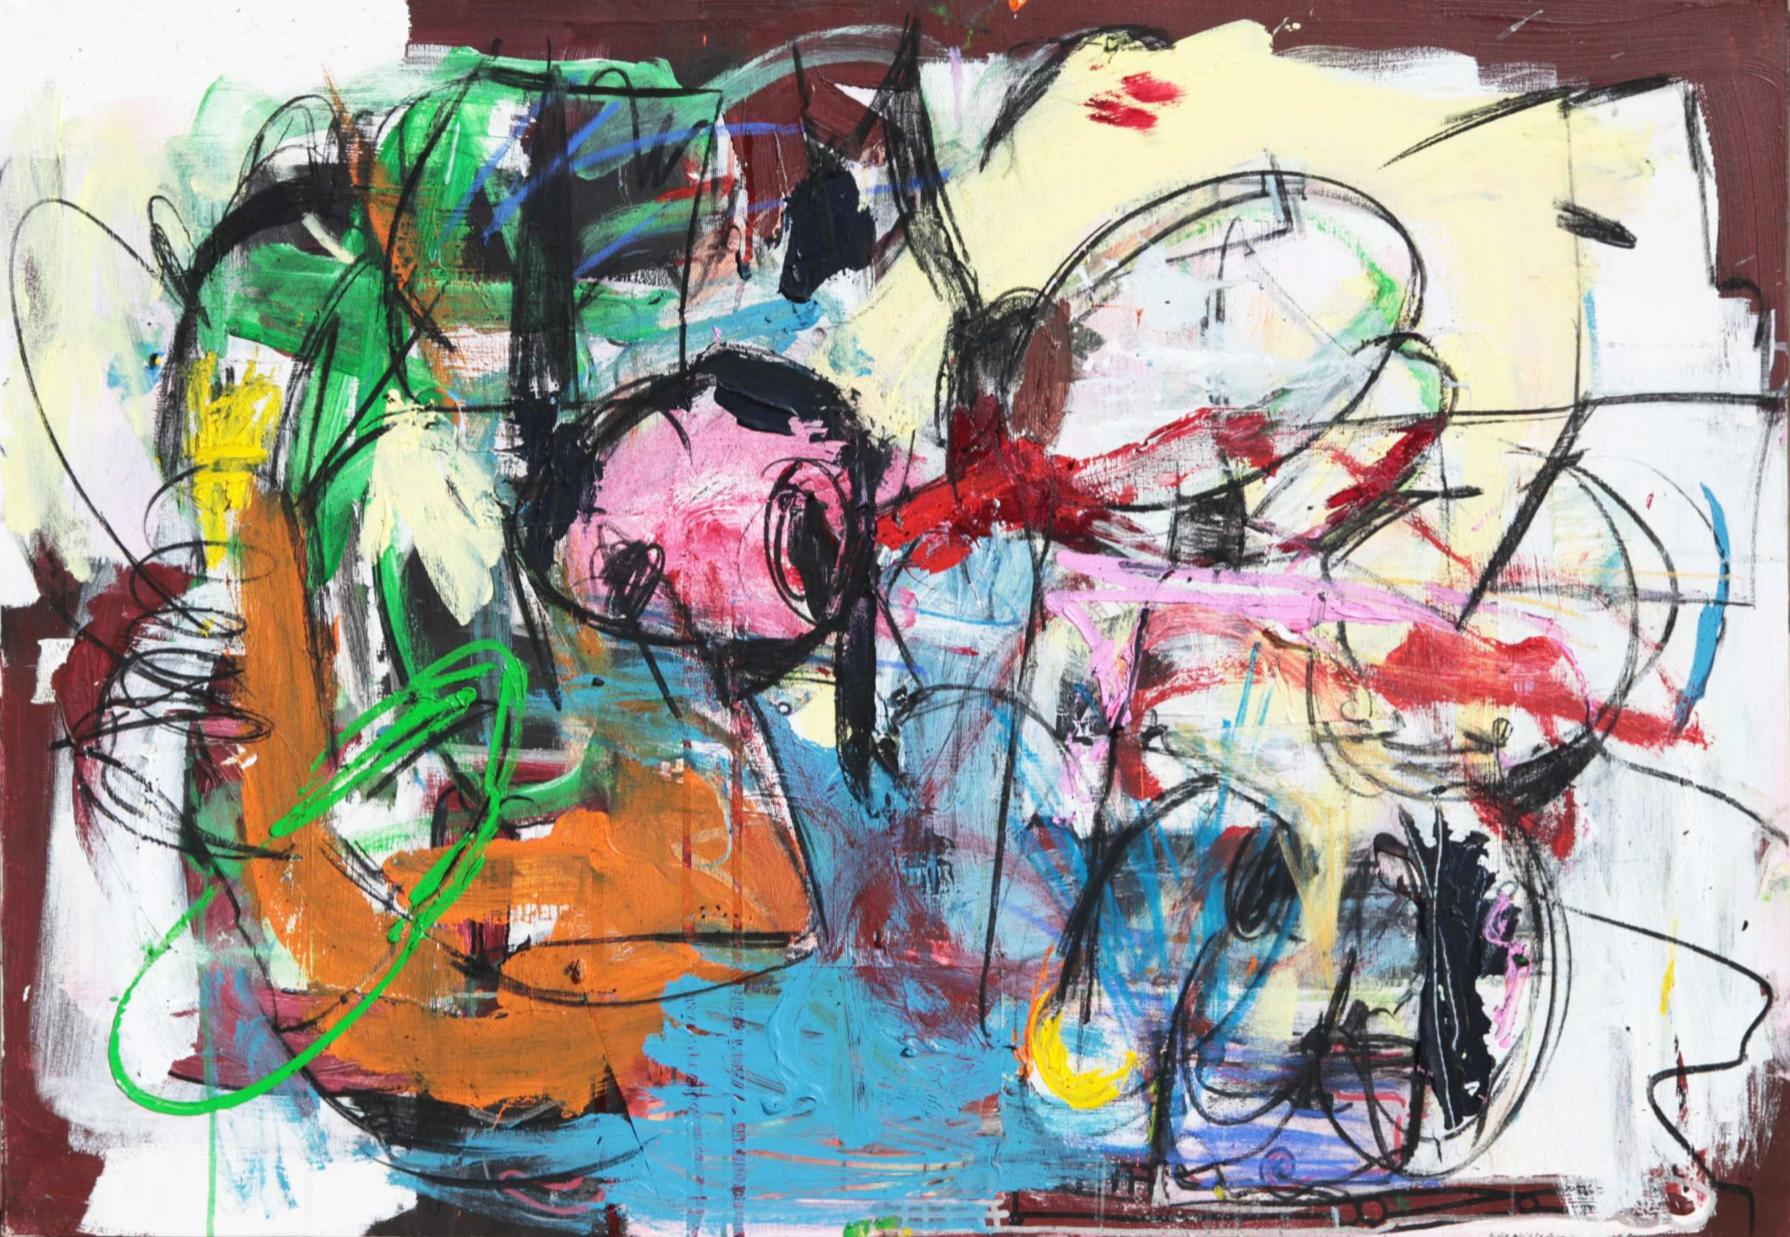 A Match On Tinder   Oil, Acrylic and Spray Paint on Canvas